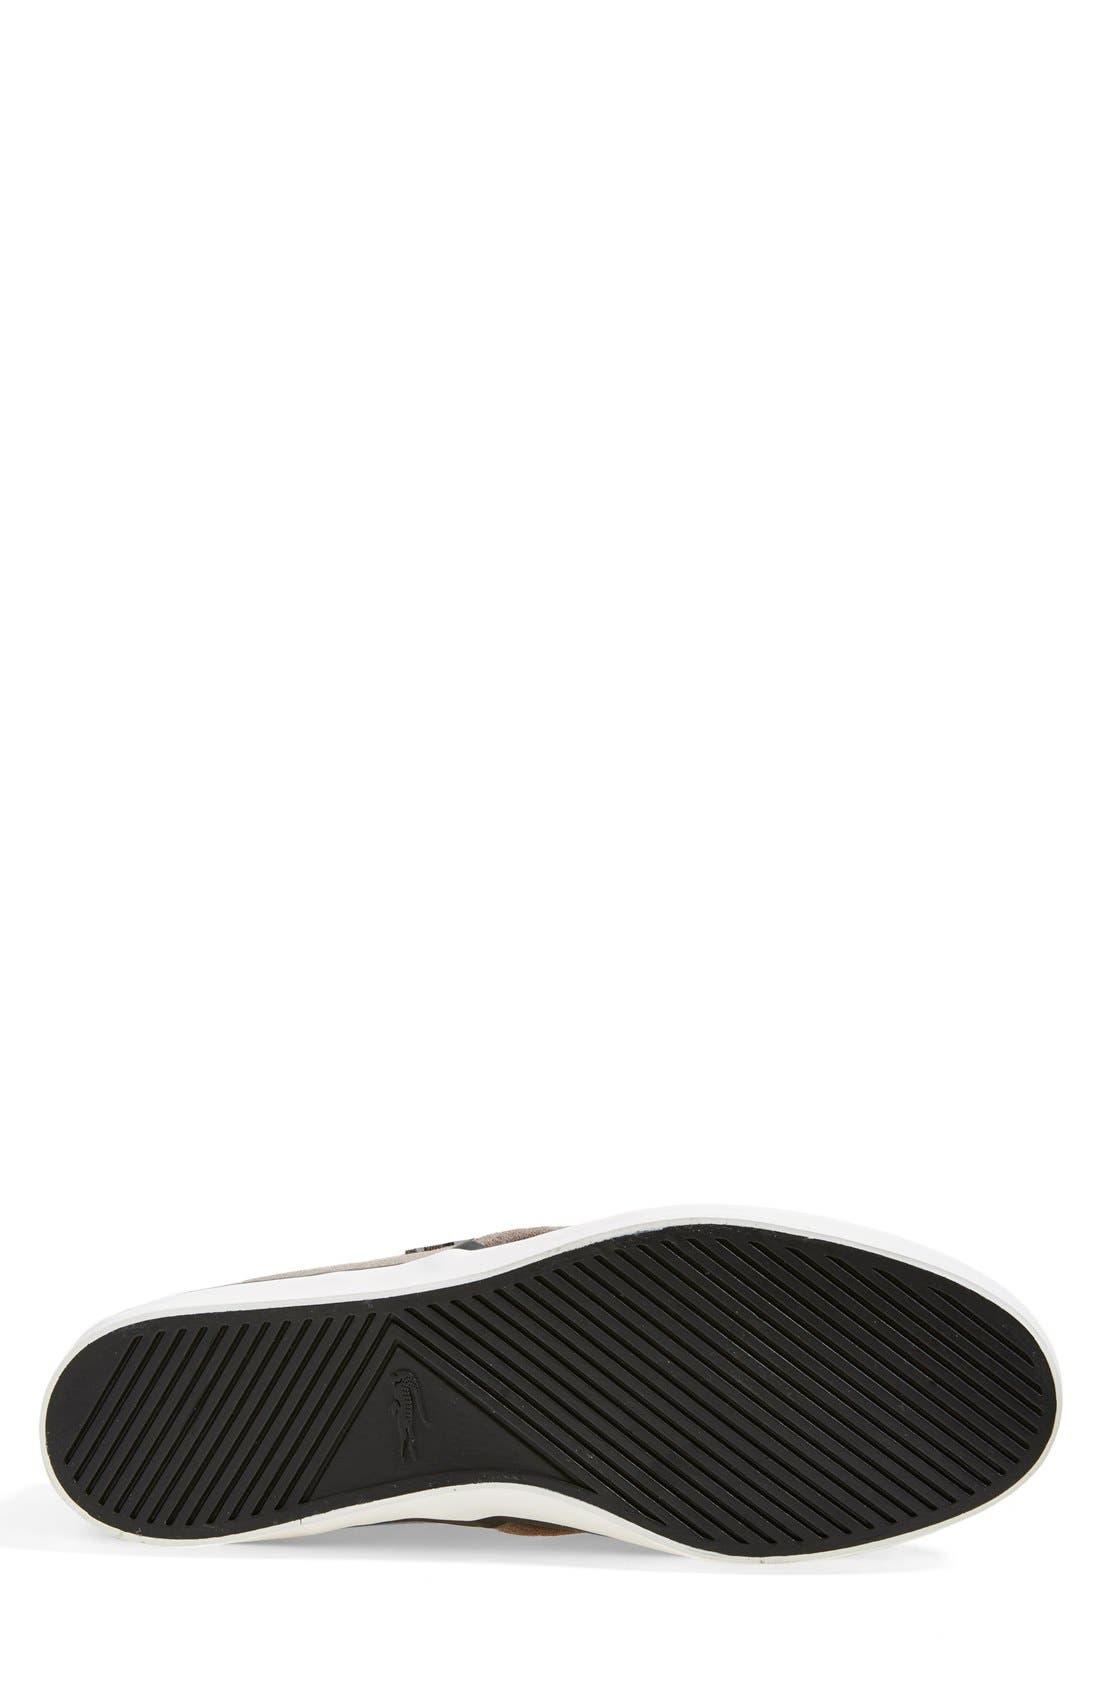 Alternate Image 4  - Lacoste 'Sevrin 4' Sneaker (Men) (Online Only)